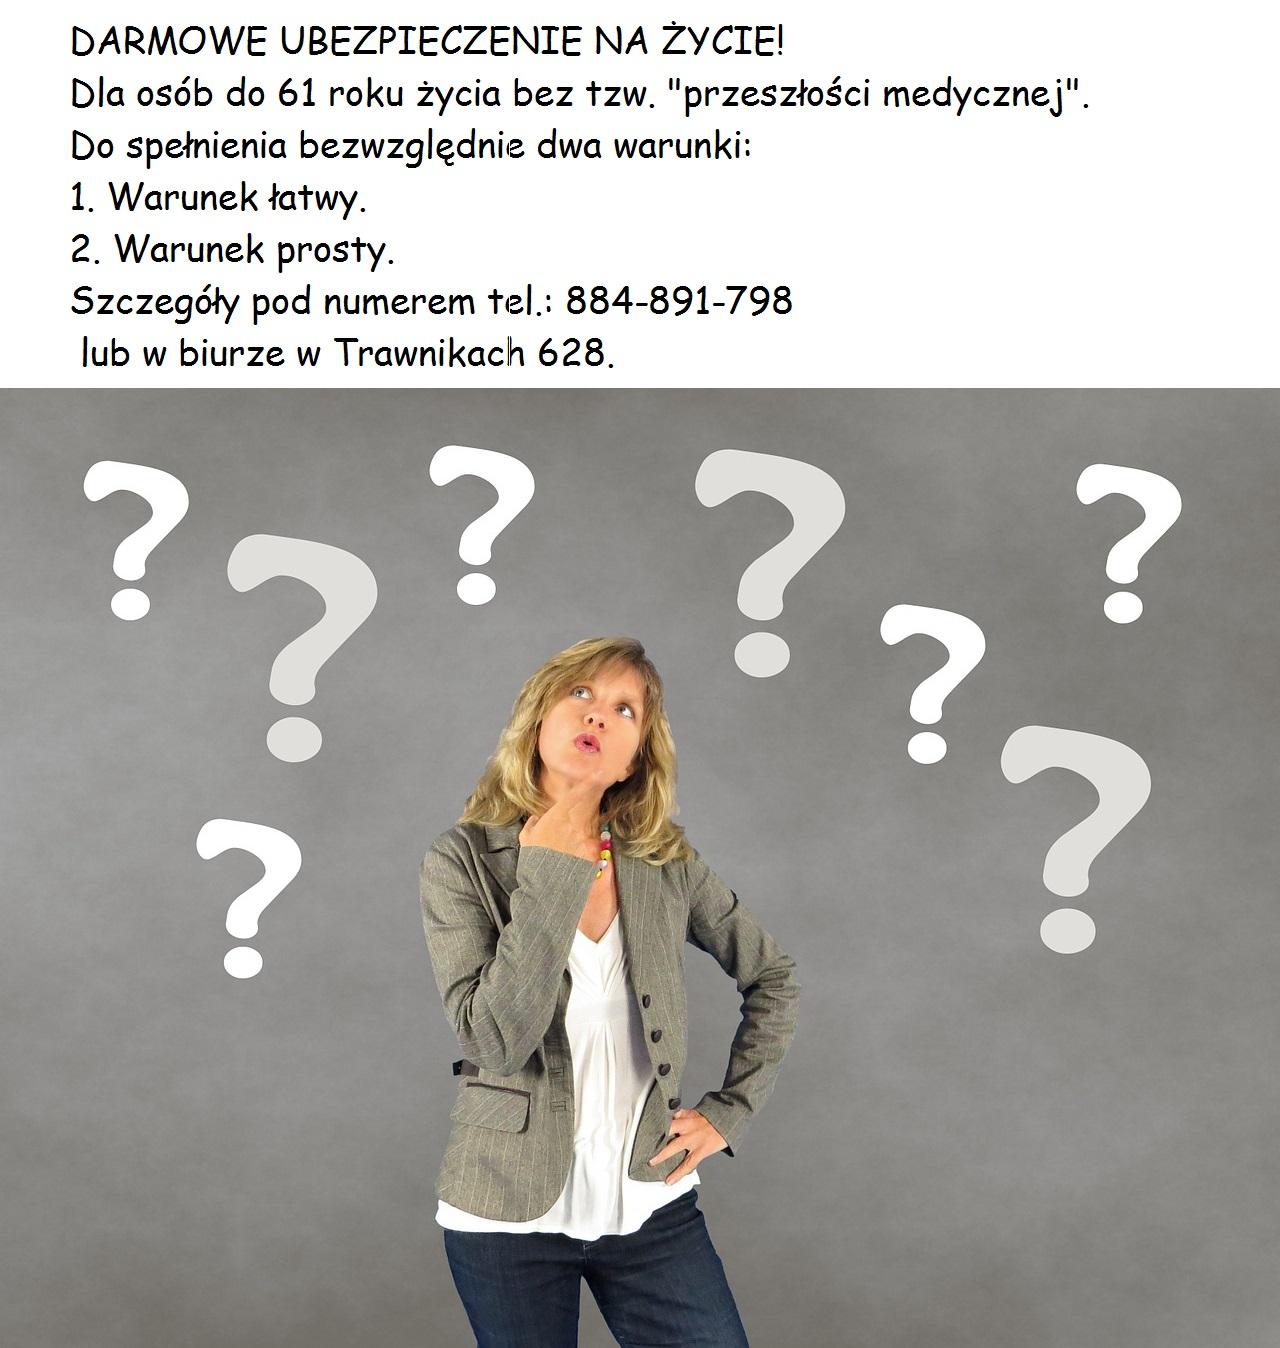 woman-687560_1280 v